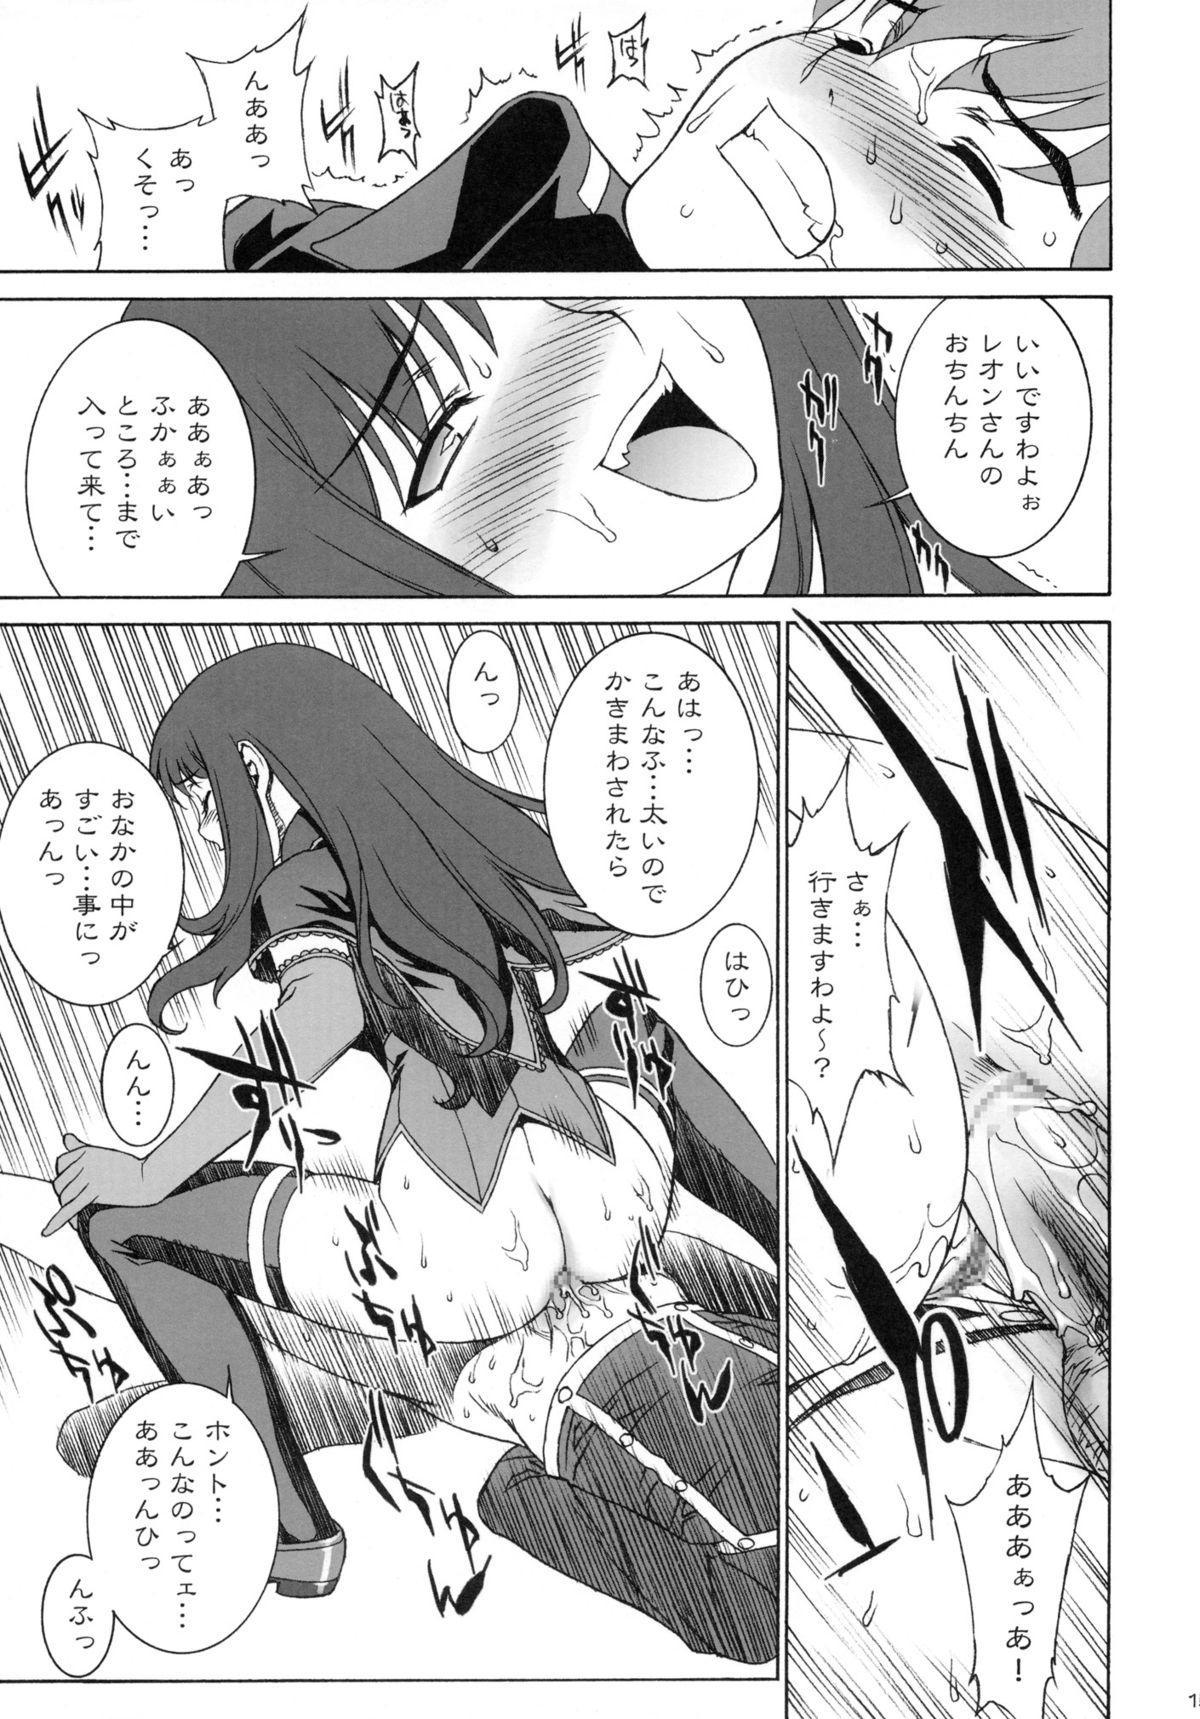 Momoiro! Mahou Gakuin 13